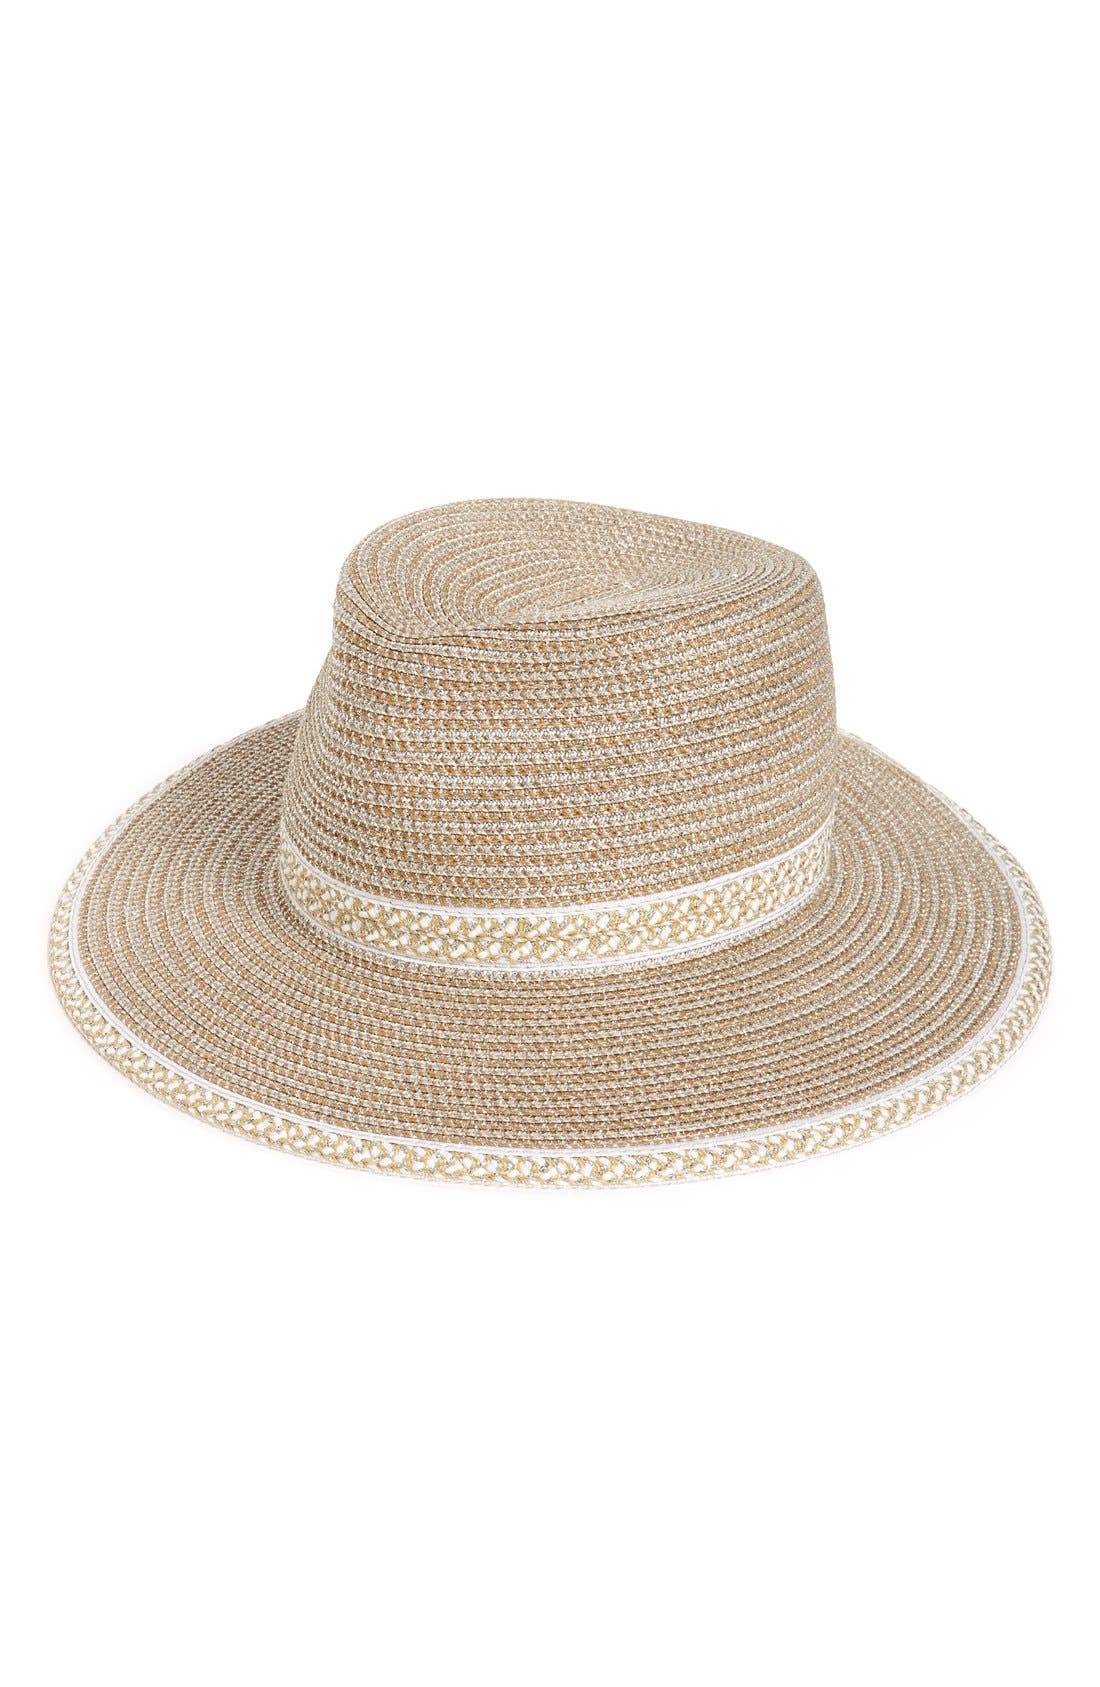 'Georgia' Woven Hat,                         Main,                         color, 100